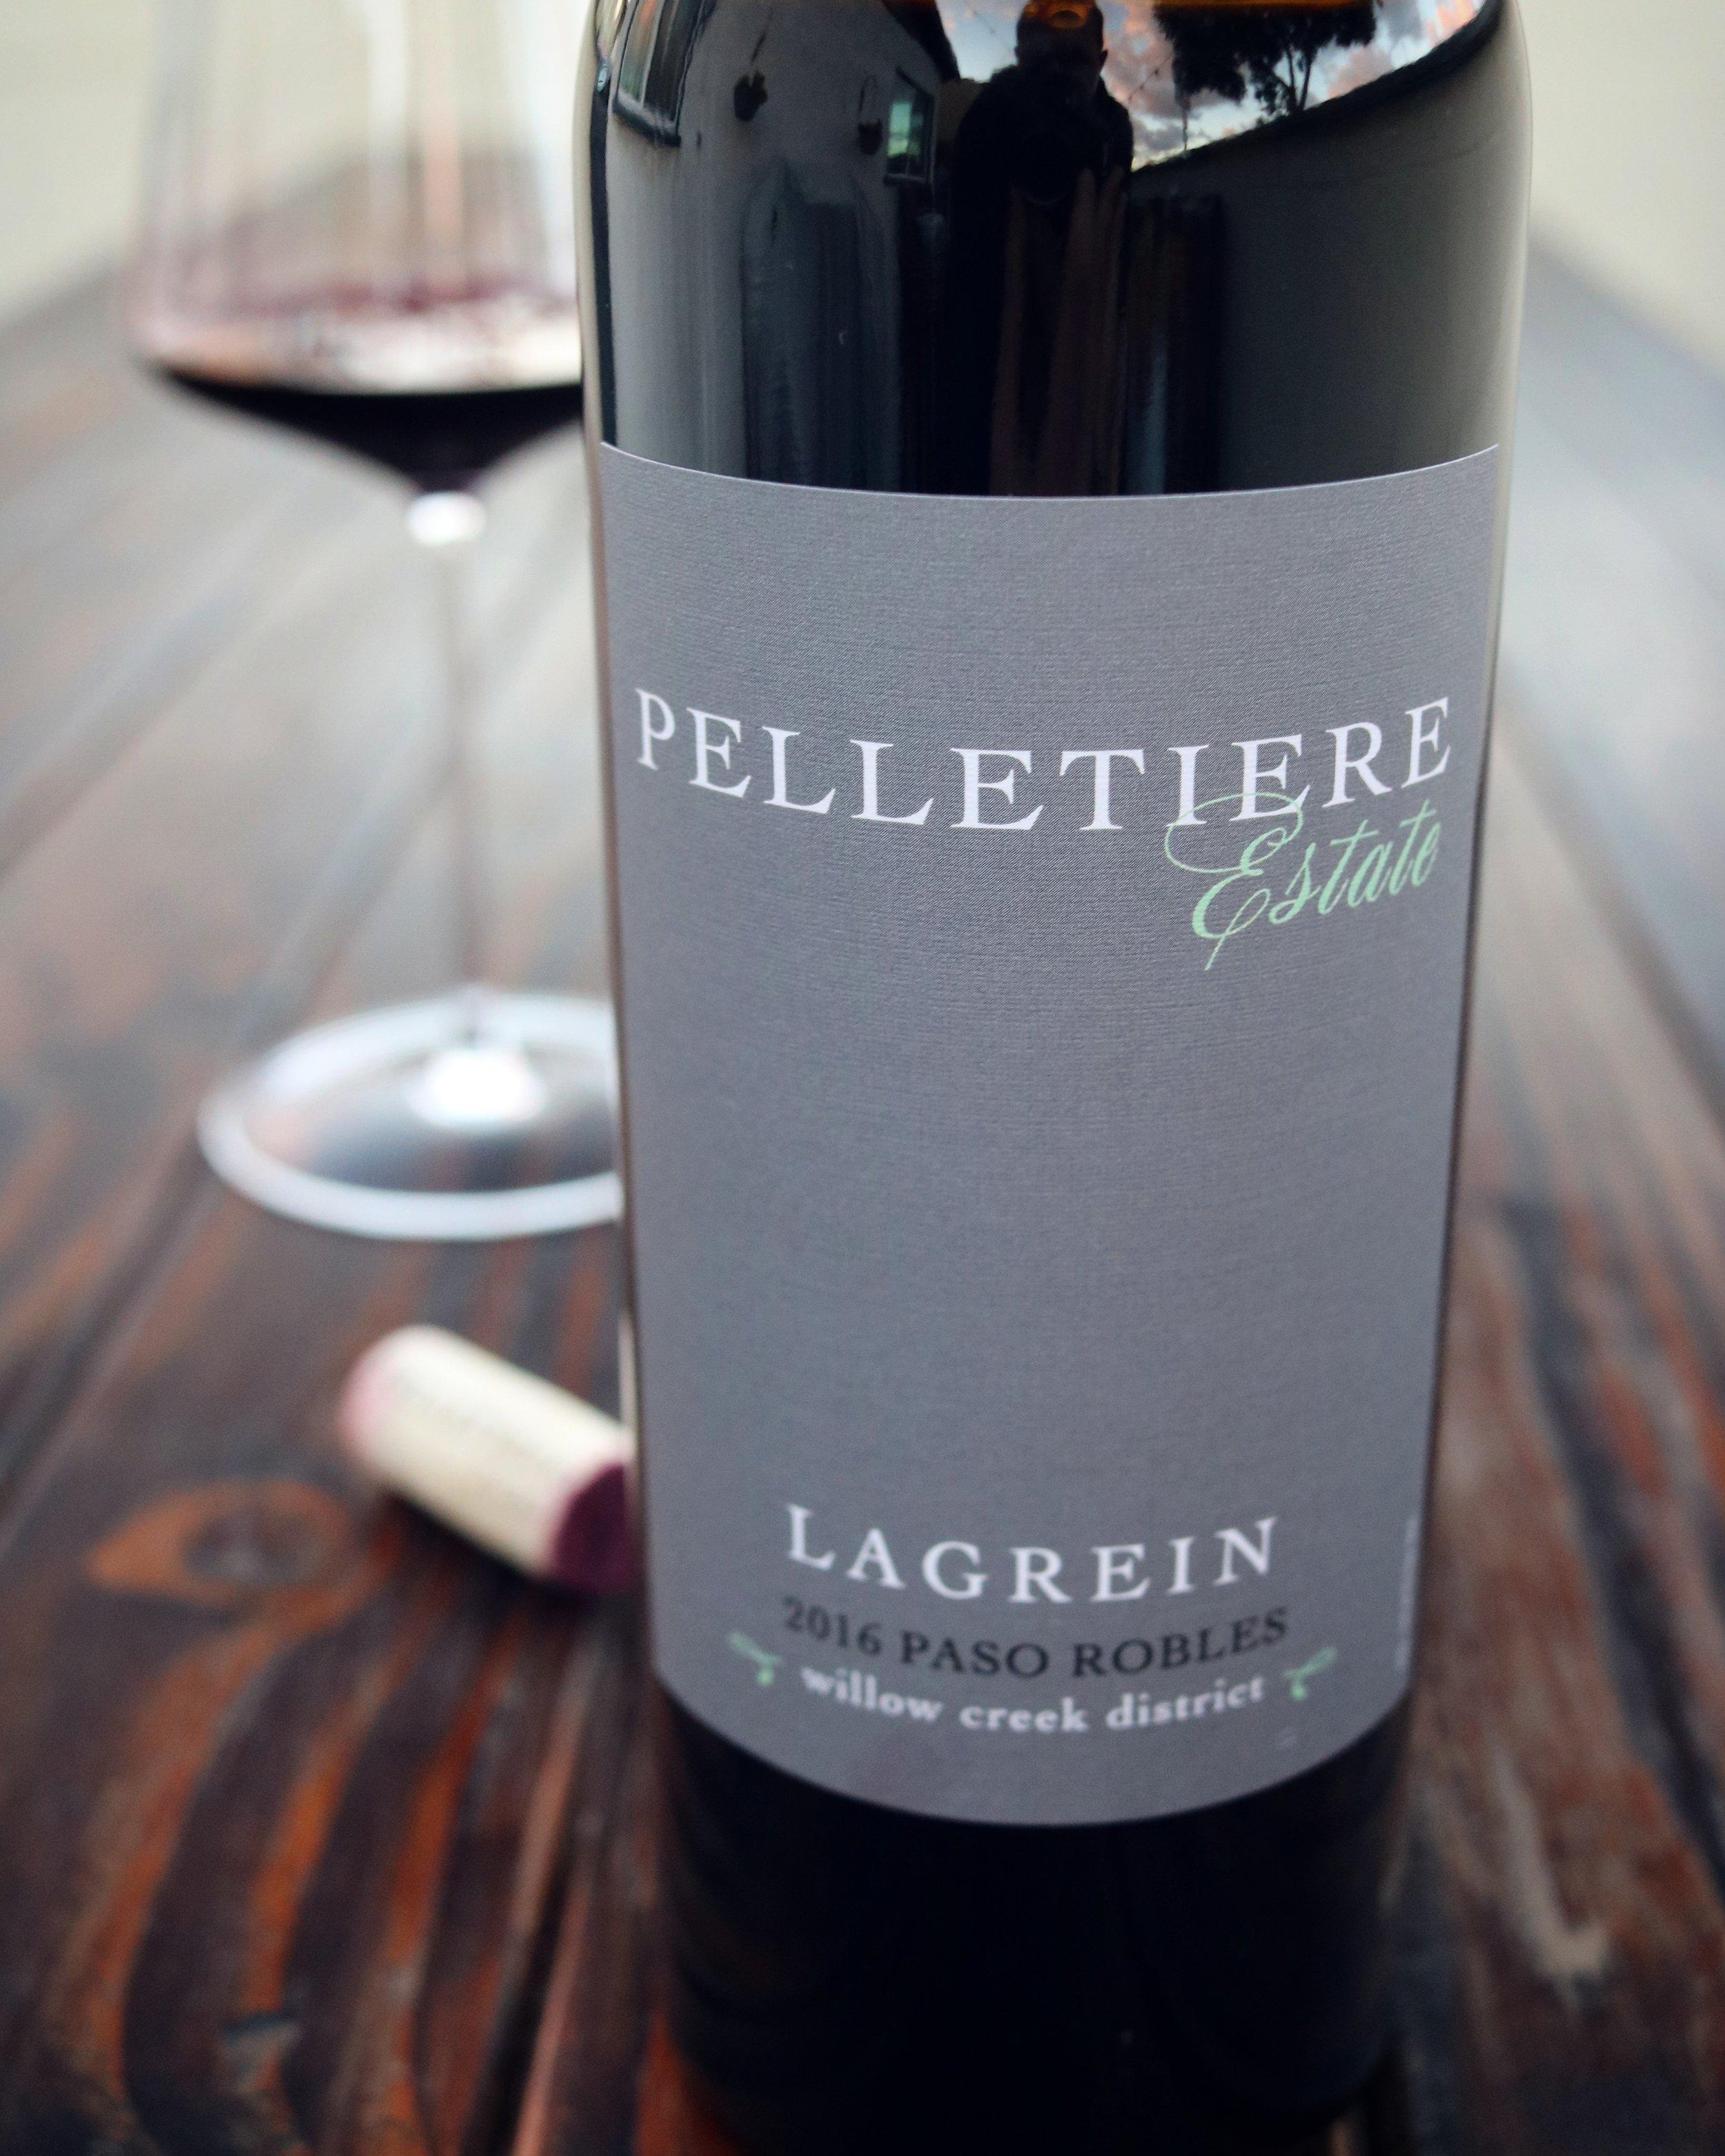 Pelletiere Estate - Lagrein.jpg